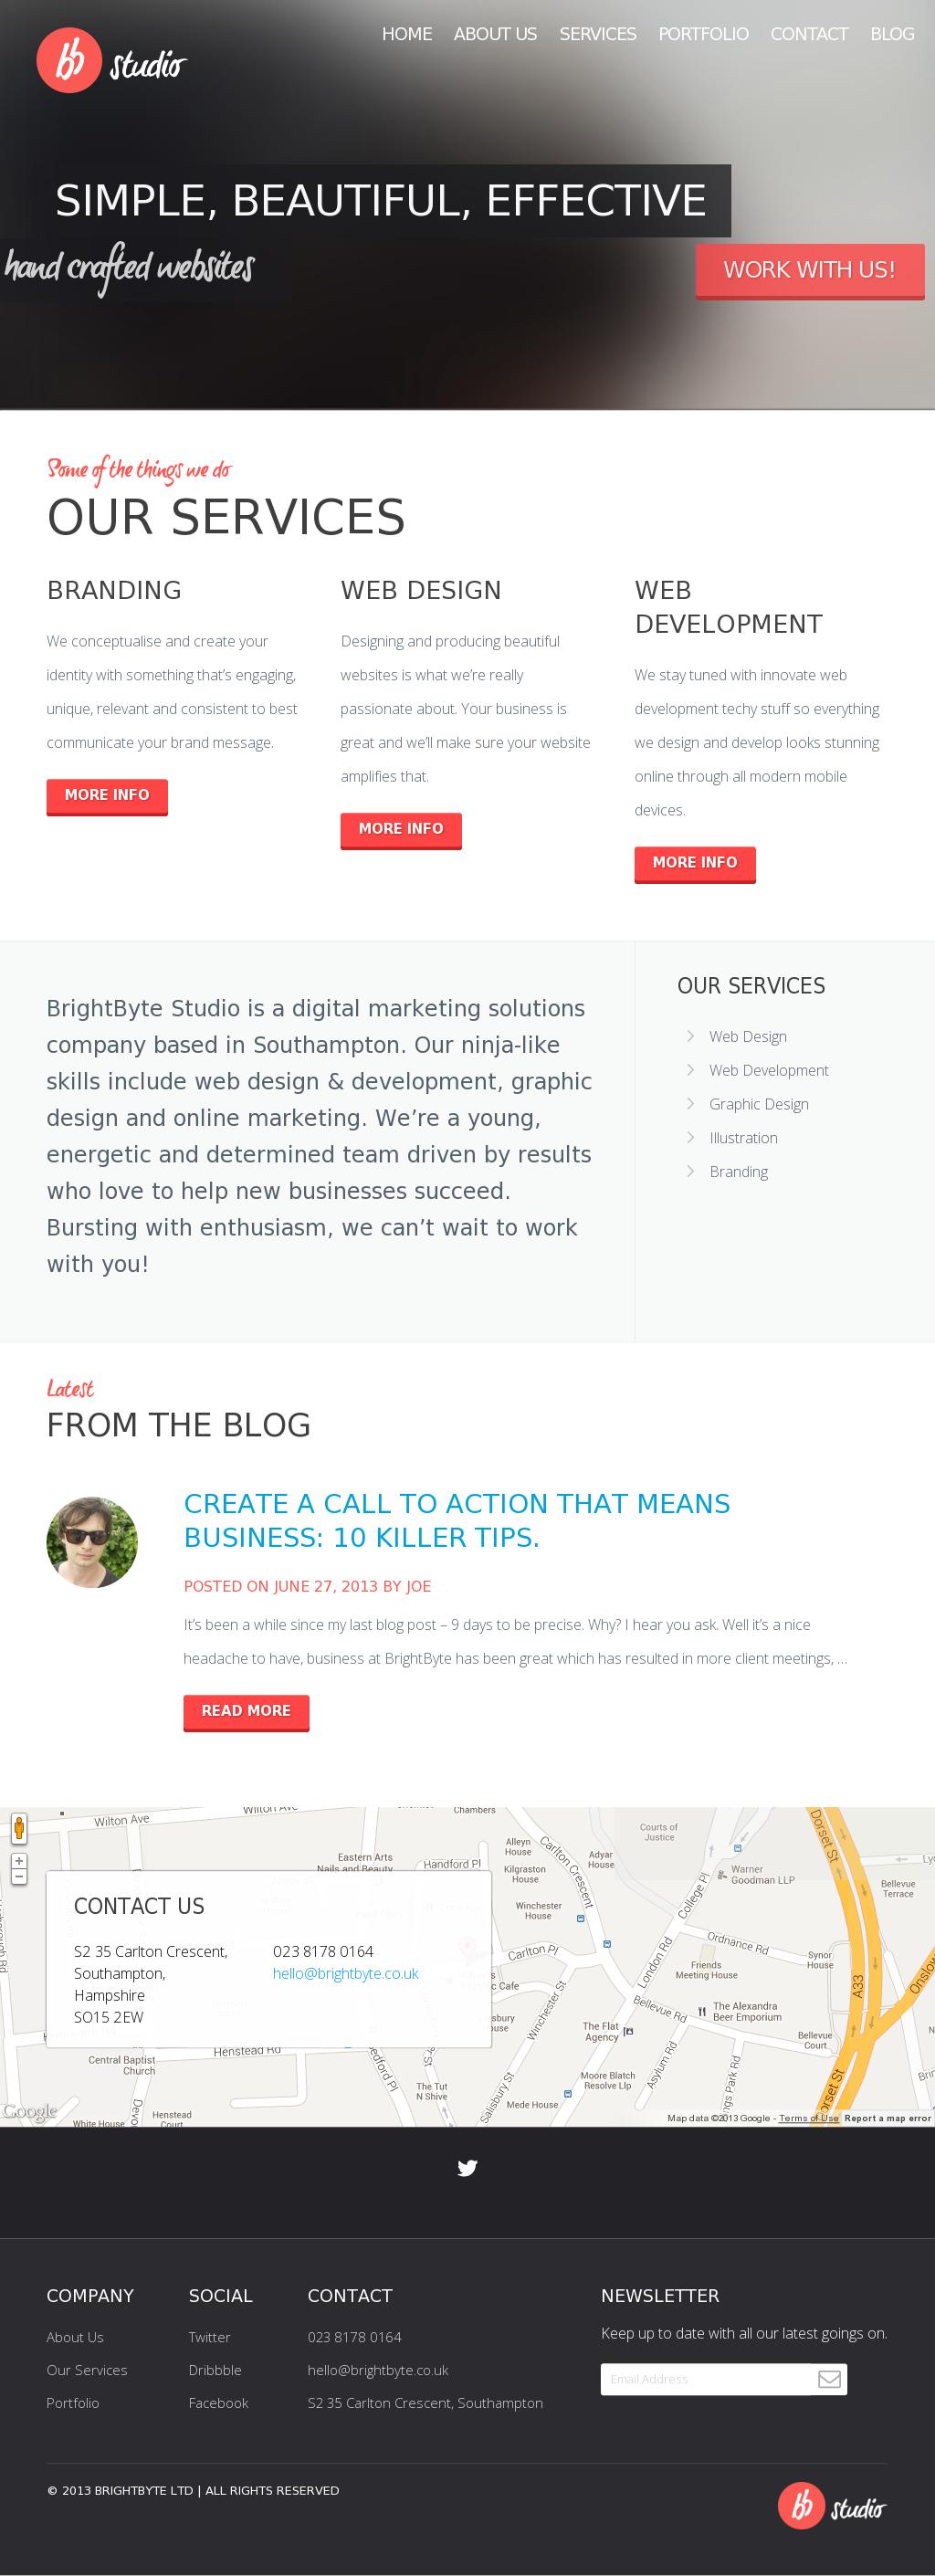 Flat Web Design Using Blurred Background Image Web Design Flat Web Design Web Inspiration